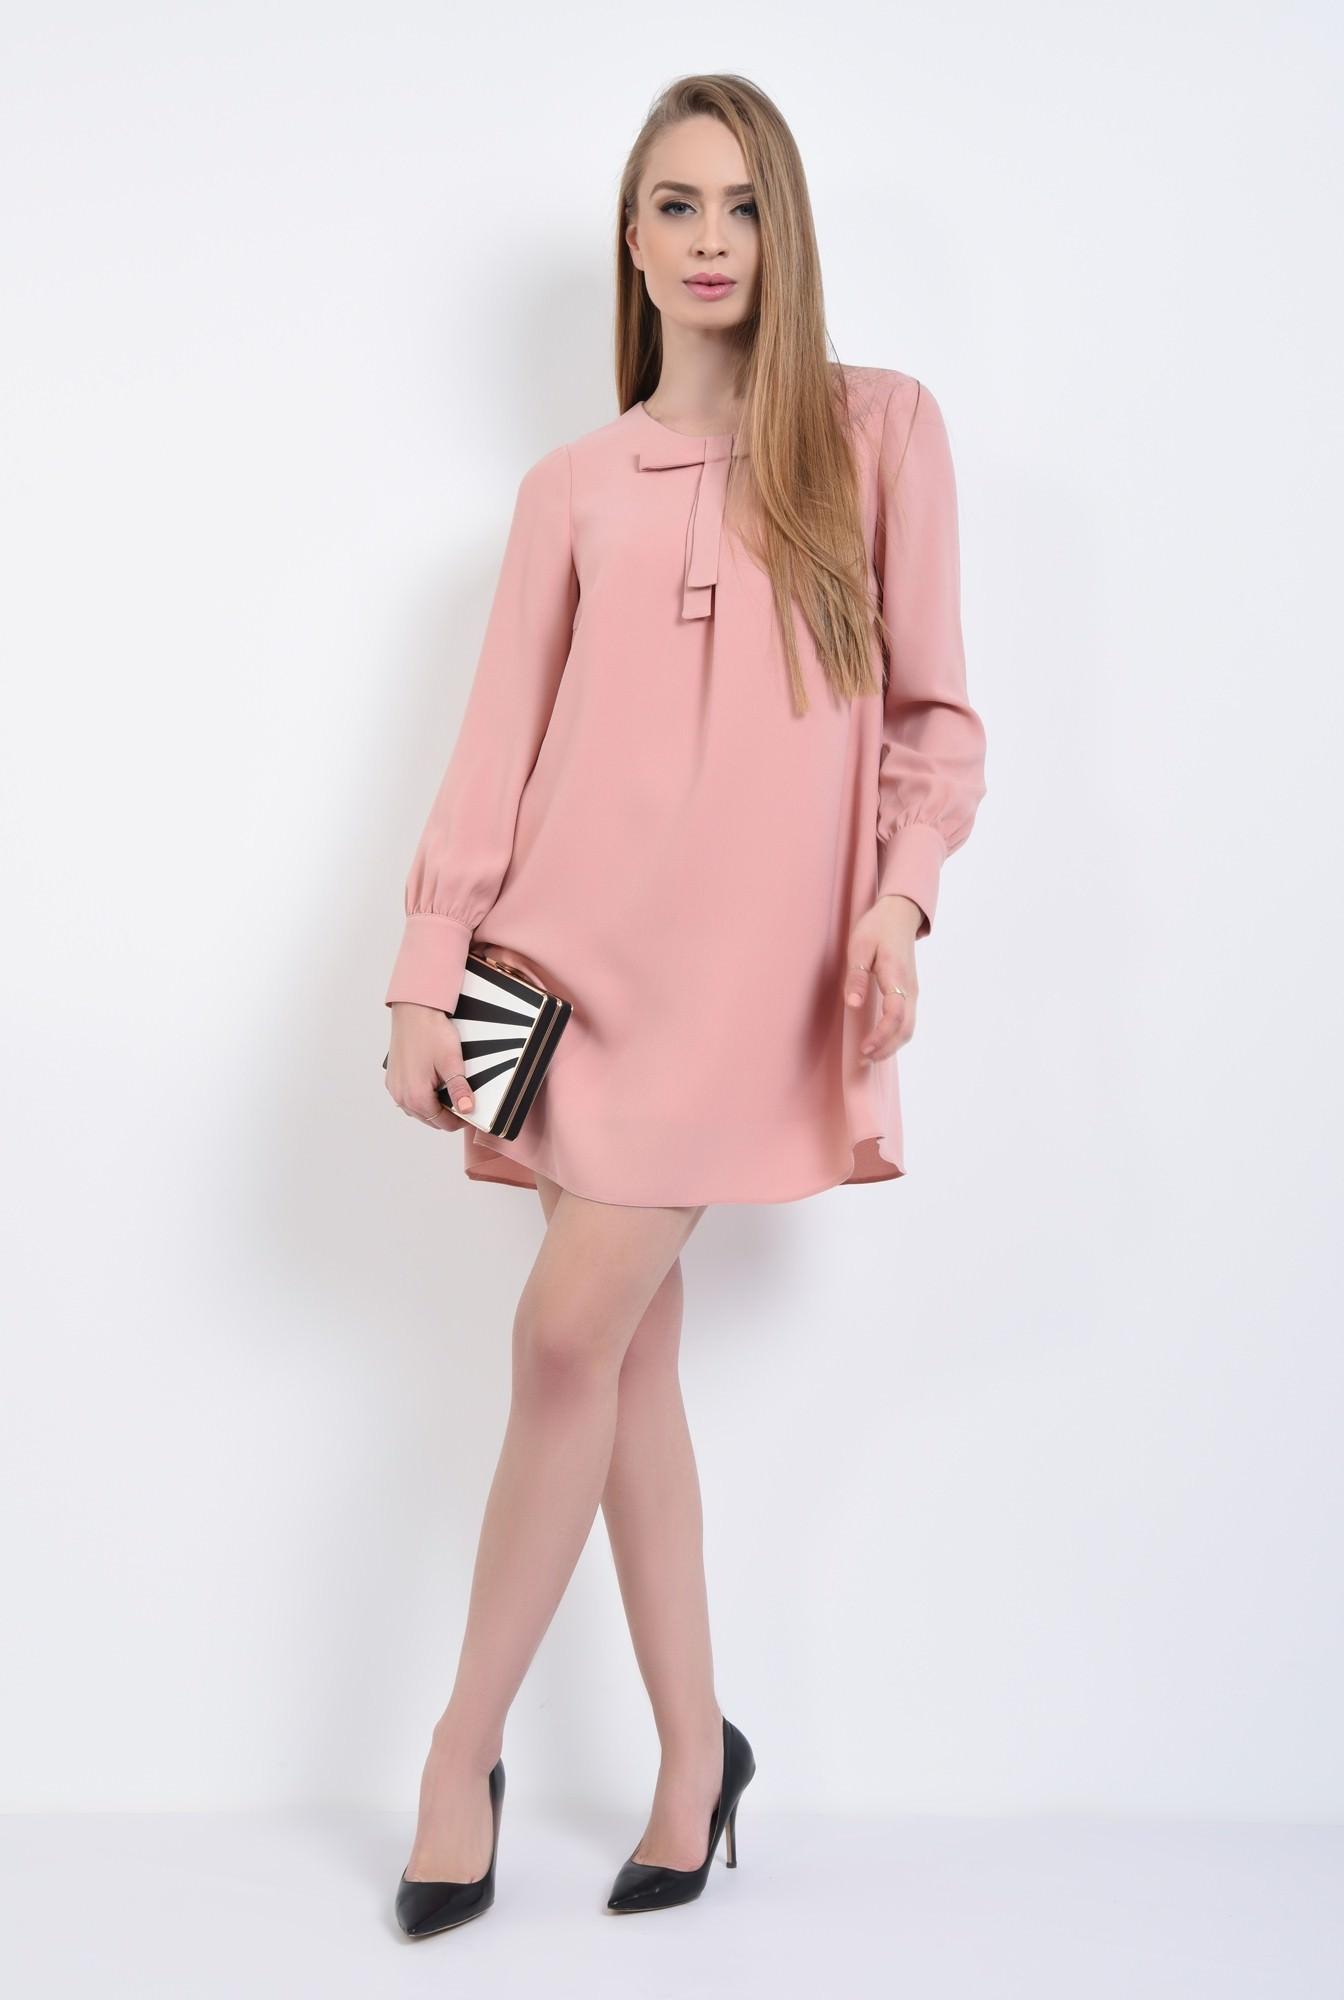 3 - Rochie de zi scurta, roz